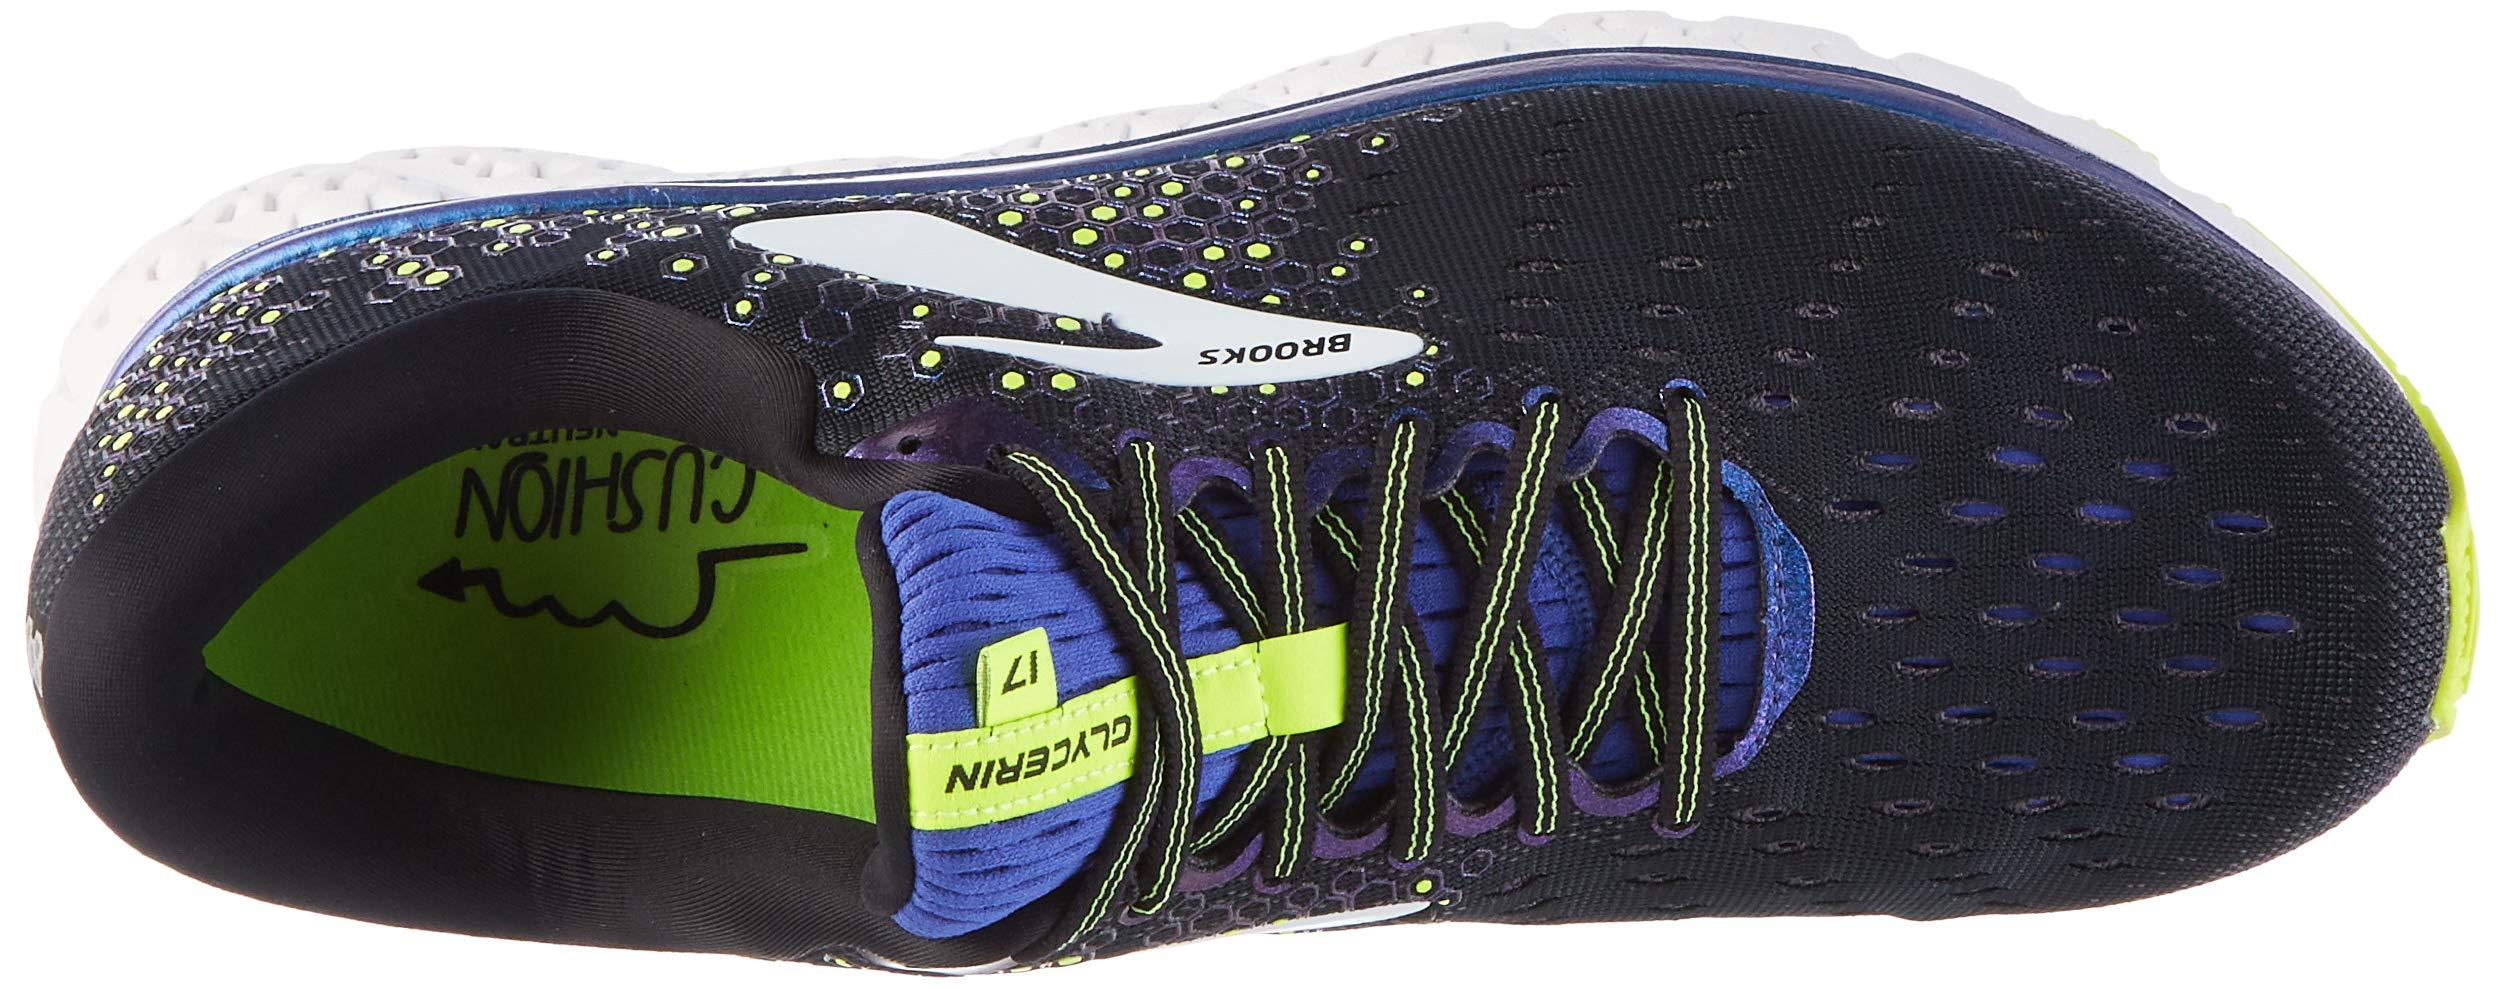 81m01yVsWOL - Brooks Men's Glycerin 17 Running Shoes